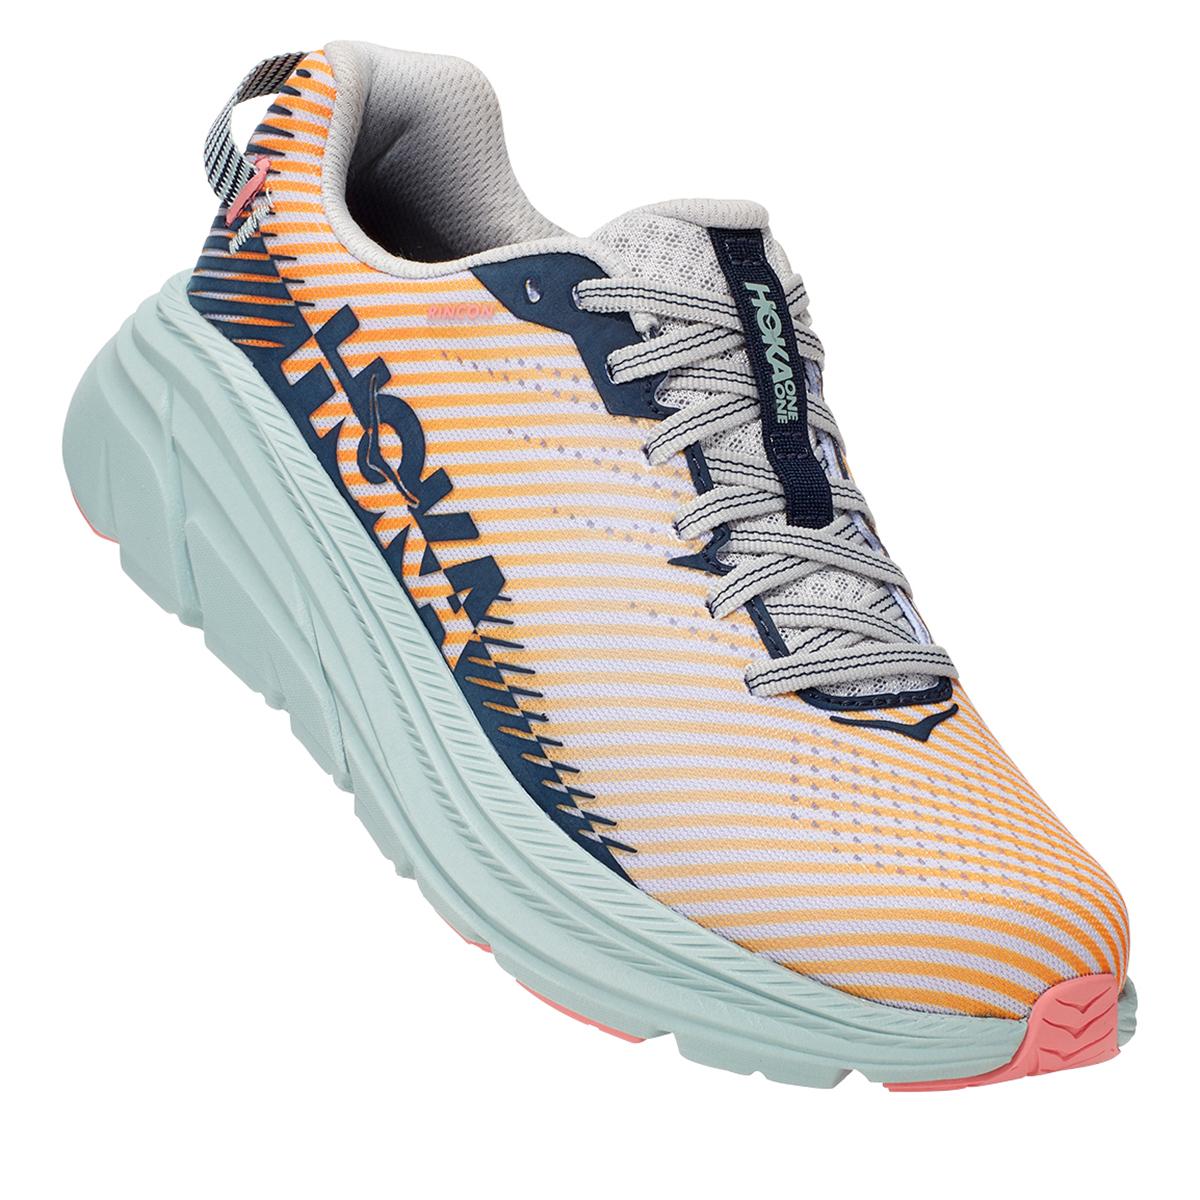 Women's Hoka One One Rincon 2 Running Shoe - Color: Lunar Rock/Black Iris - Size: 7 - Width: Regular, Lunar Rock/Black Iris, large, image 4